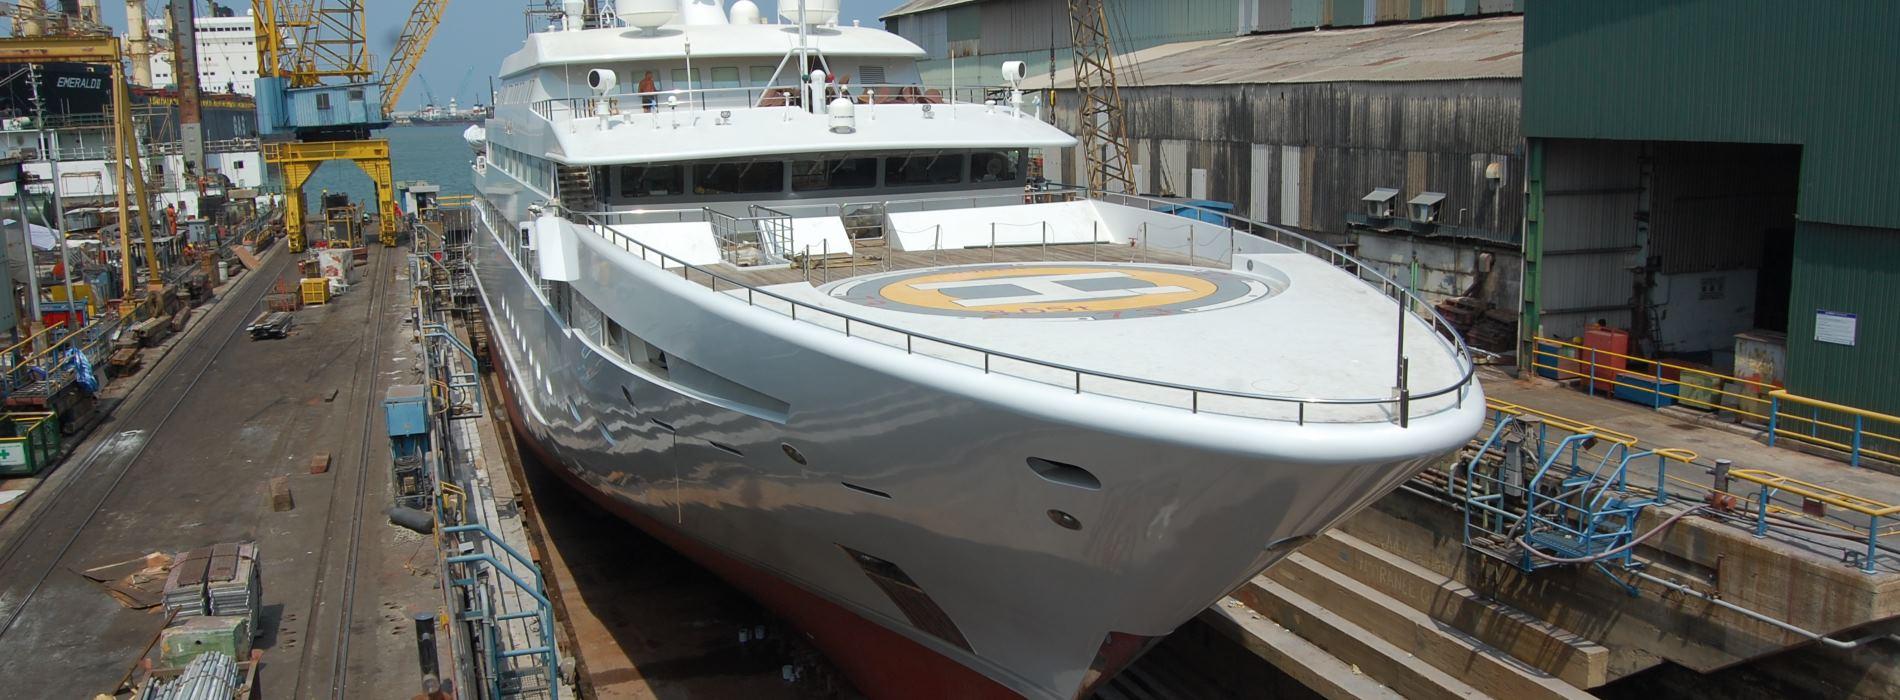 Eclipse Marine superyacht refit and repair